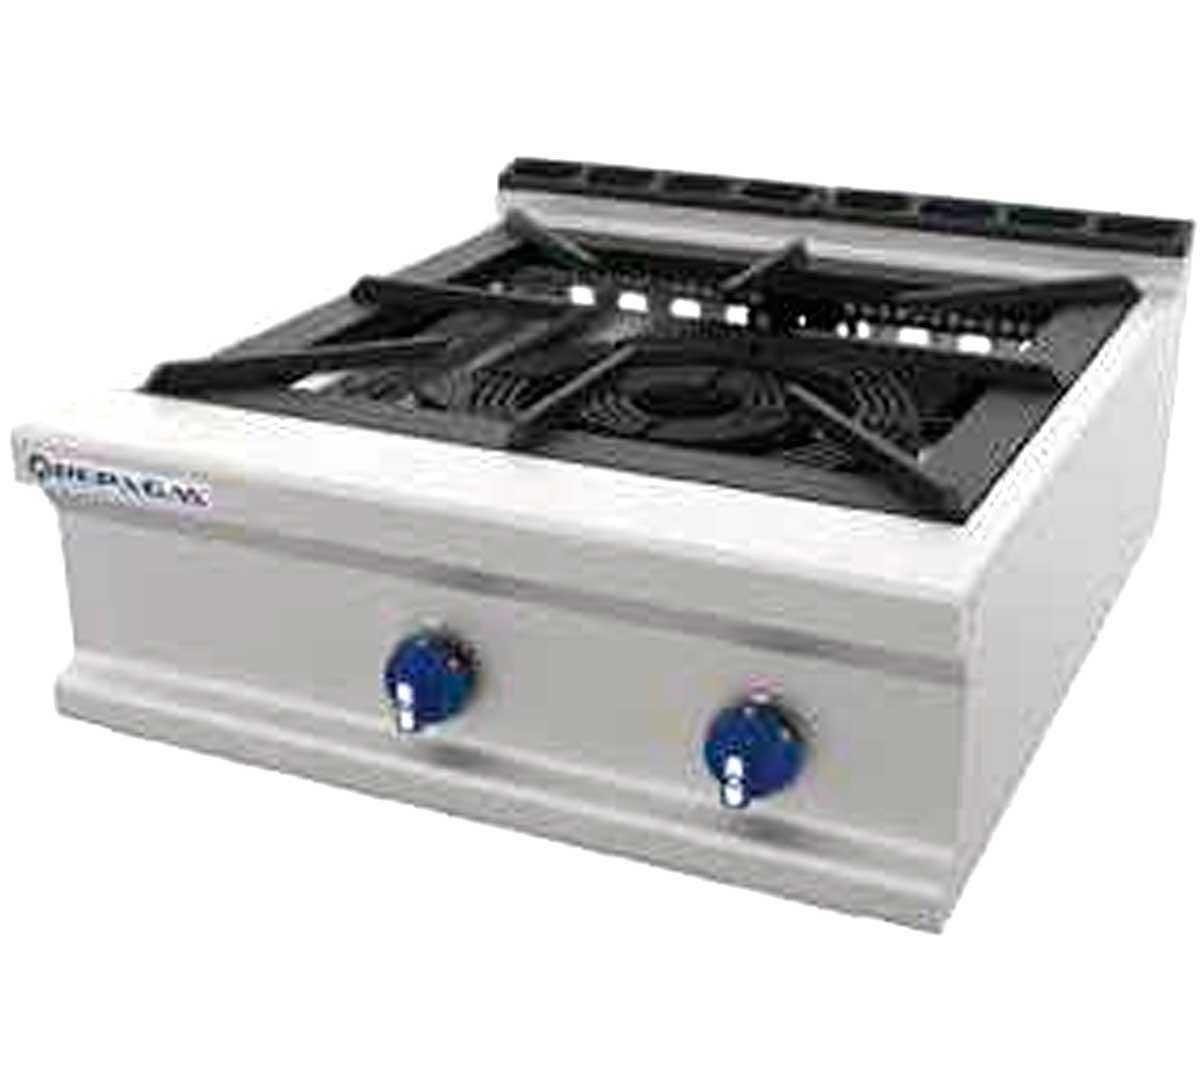 Cocina serie 900 sobremesa gas de repagas for Cocinas repagas